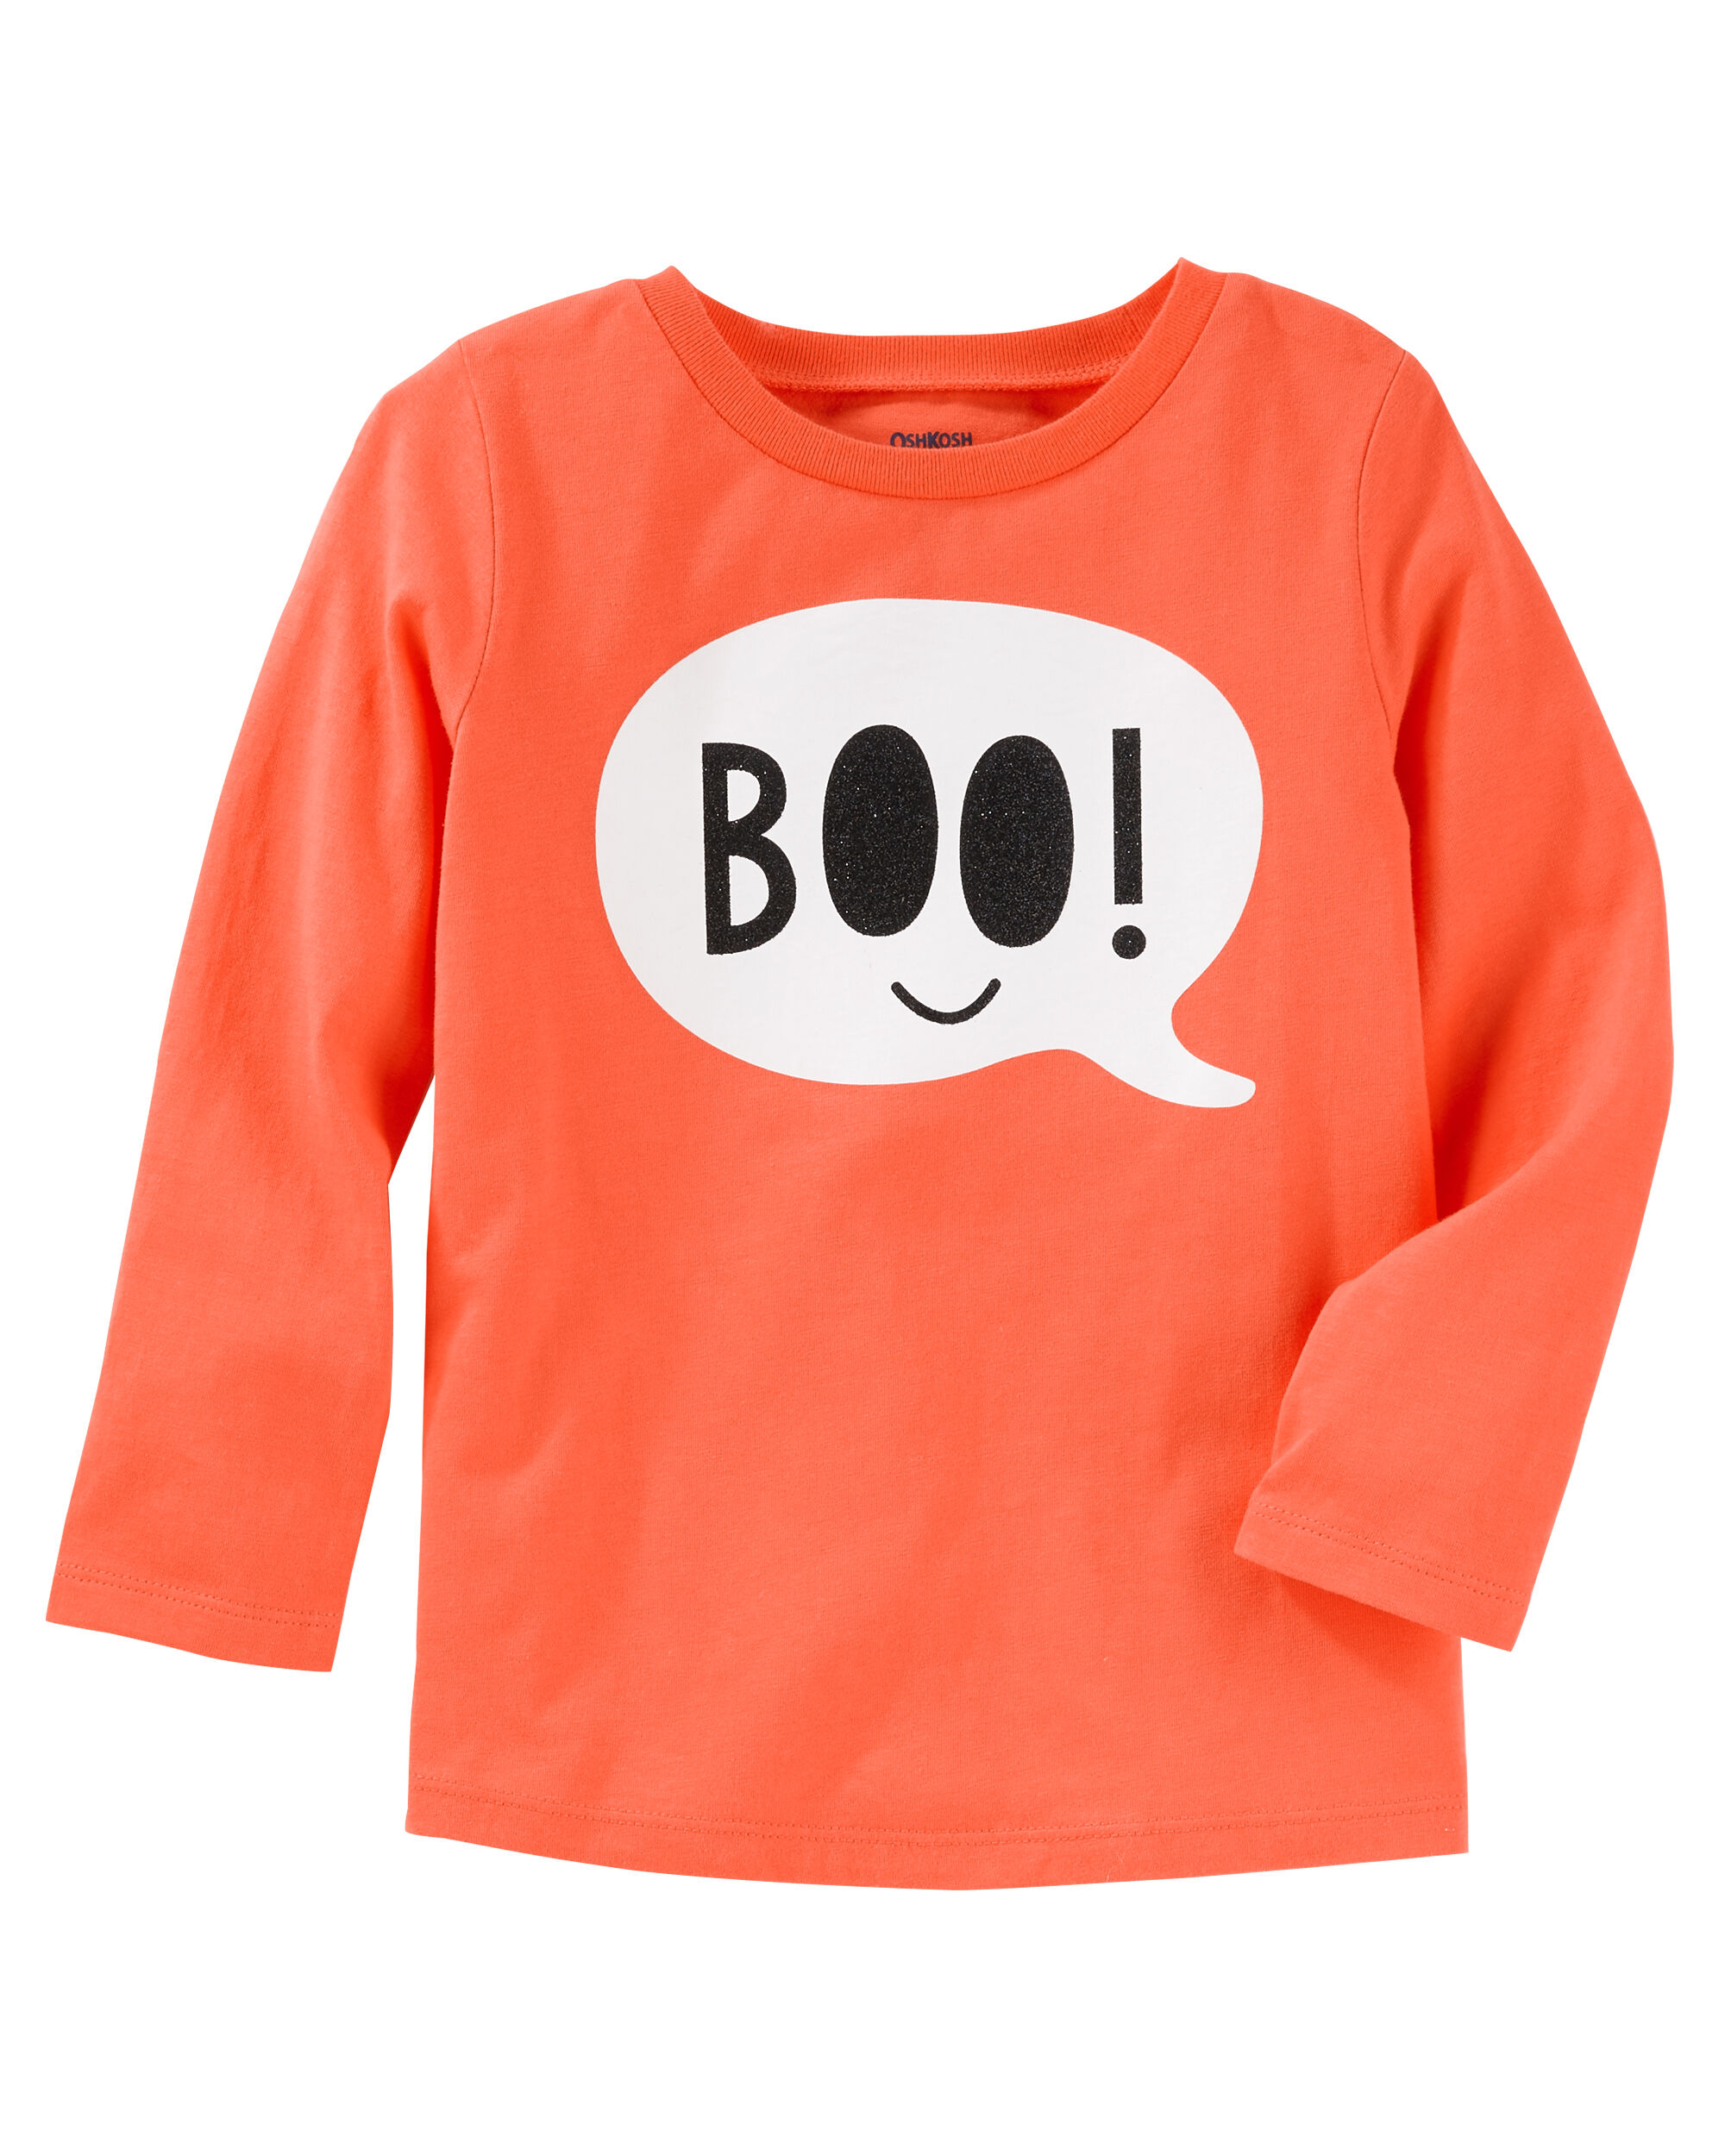 Baby Girl Halloween Costumes & Outfits | Oshkosh.com